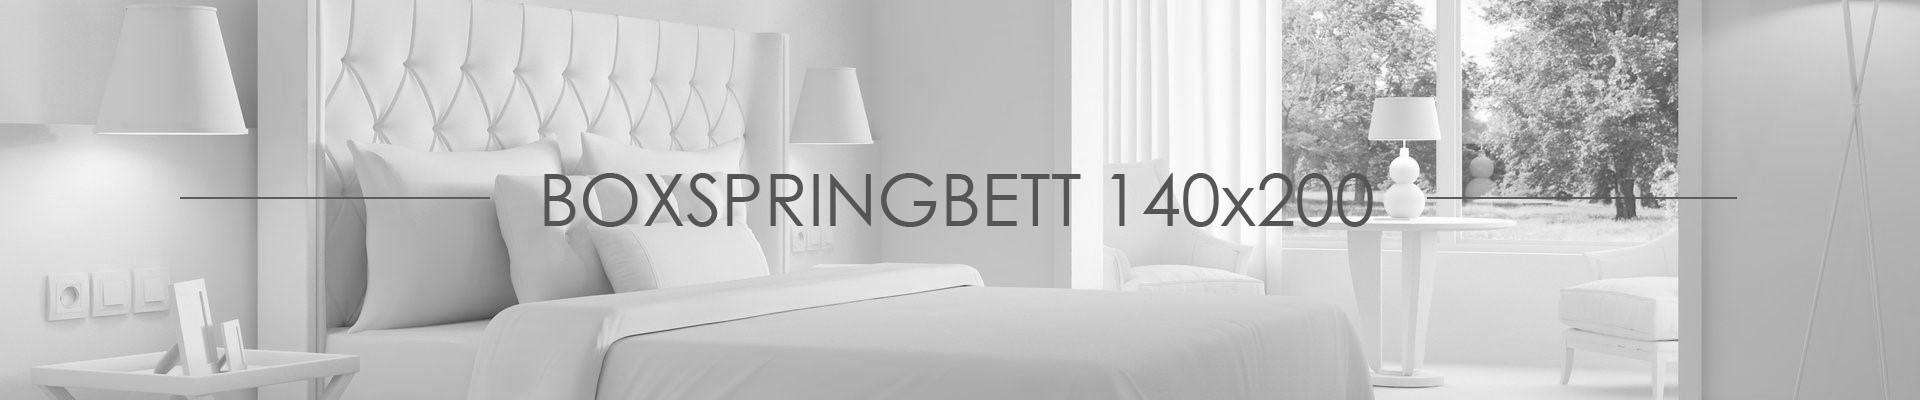 Boxspringbett 140x200